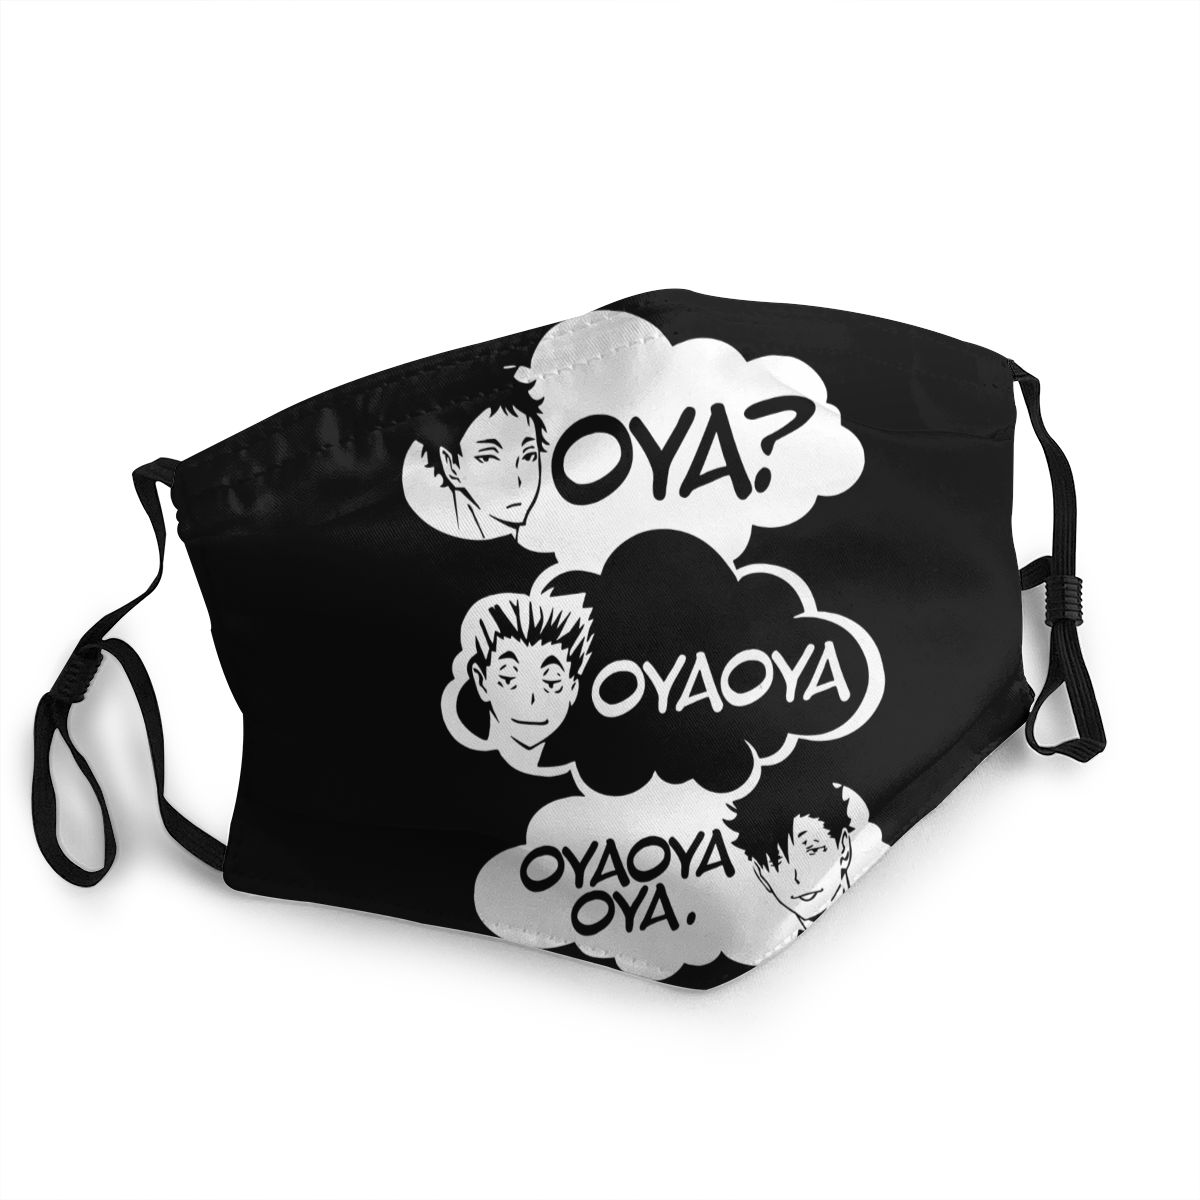 Oya Oya Oya Haikyuu Adult Face Mask Printed Kuroo Bokuto Oya Anti-Bacterial Dustproof Mask Protection Cover Respirator Muffle